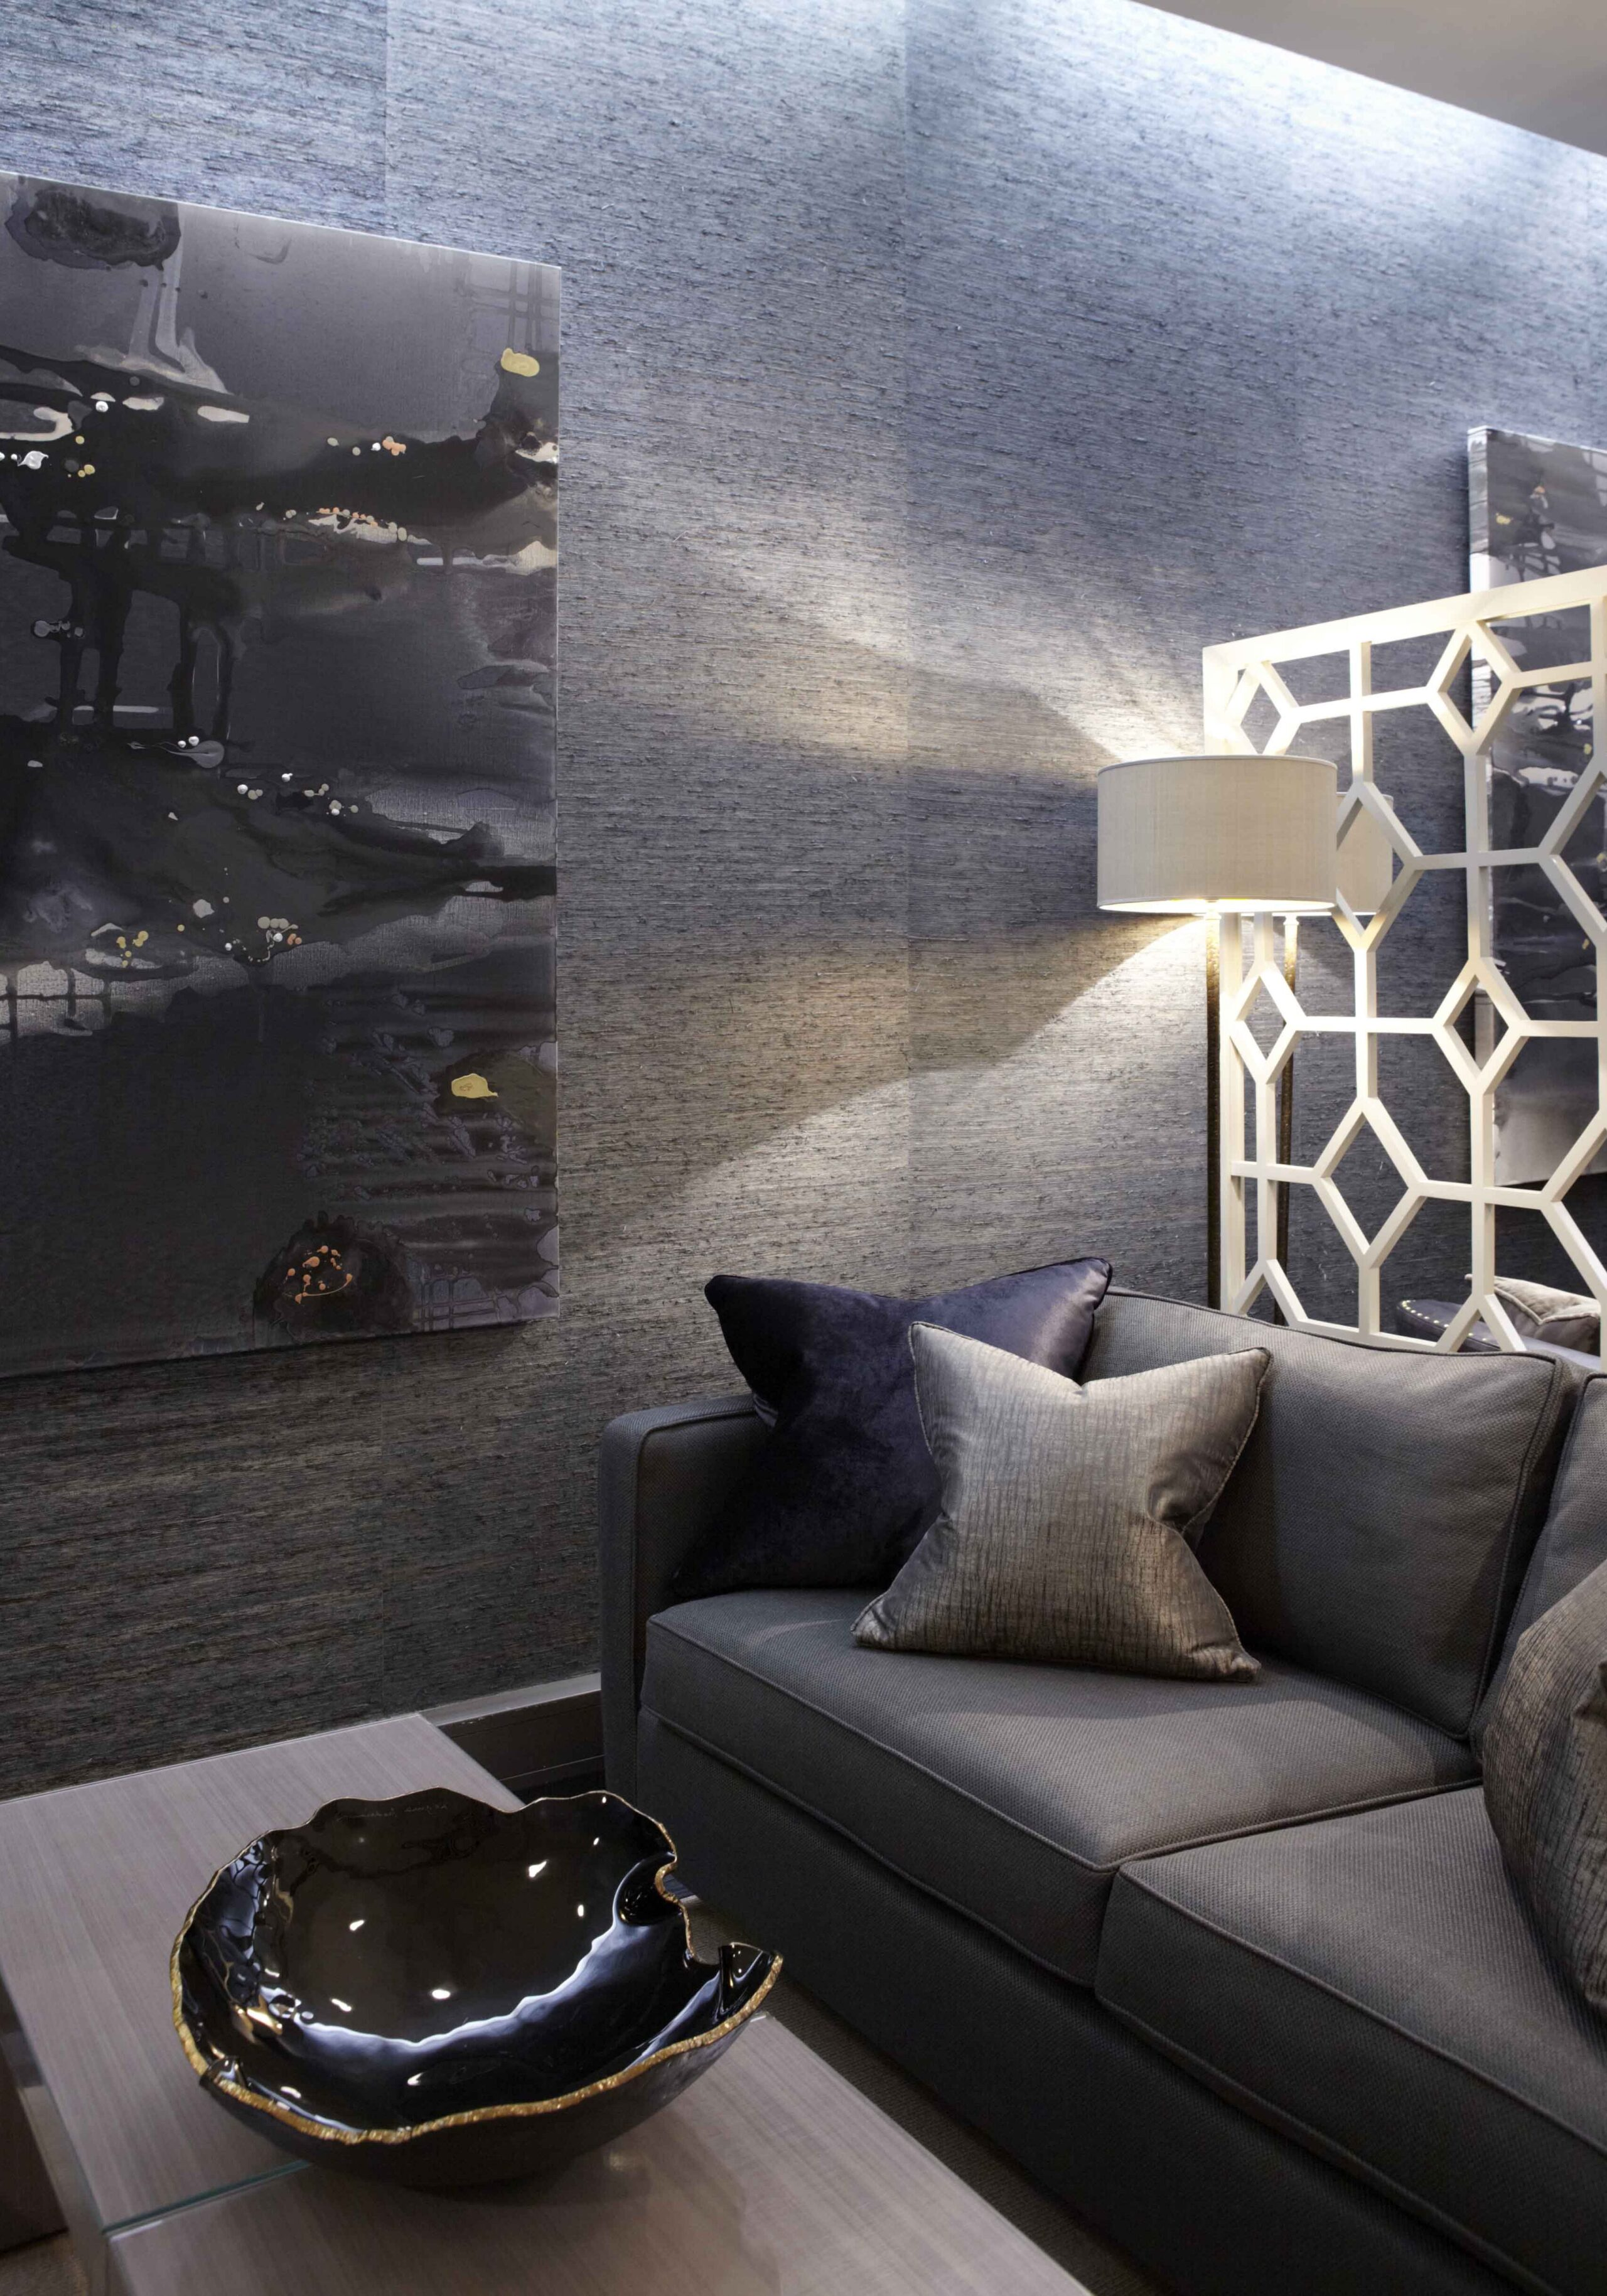 Terminal 5 Heathrow interior design project by Katharine Pooley